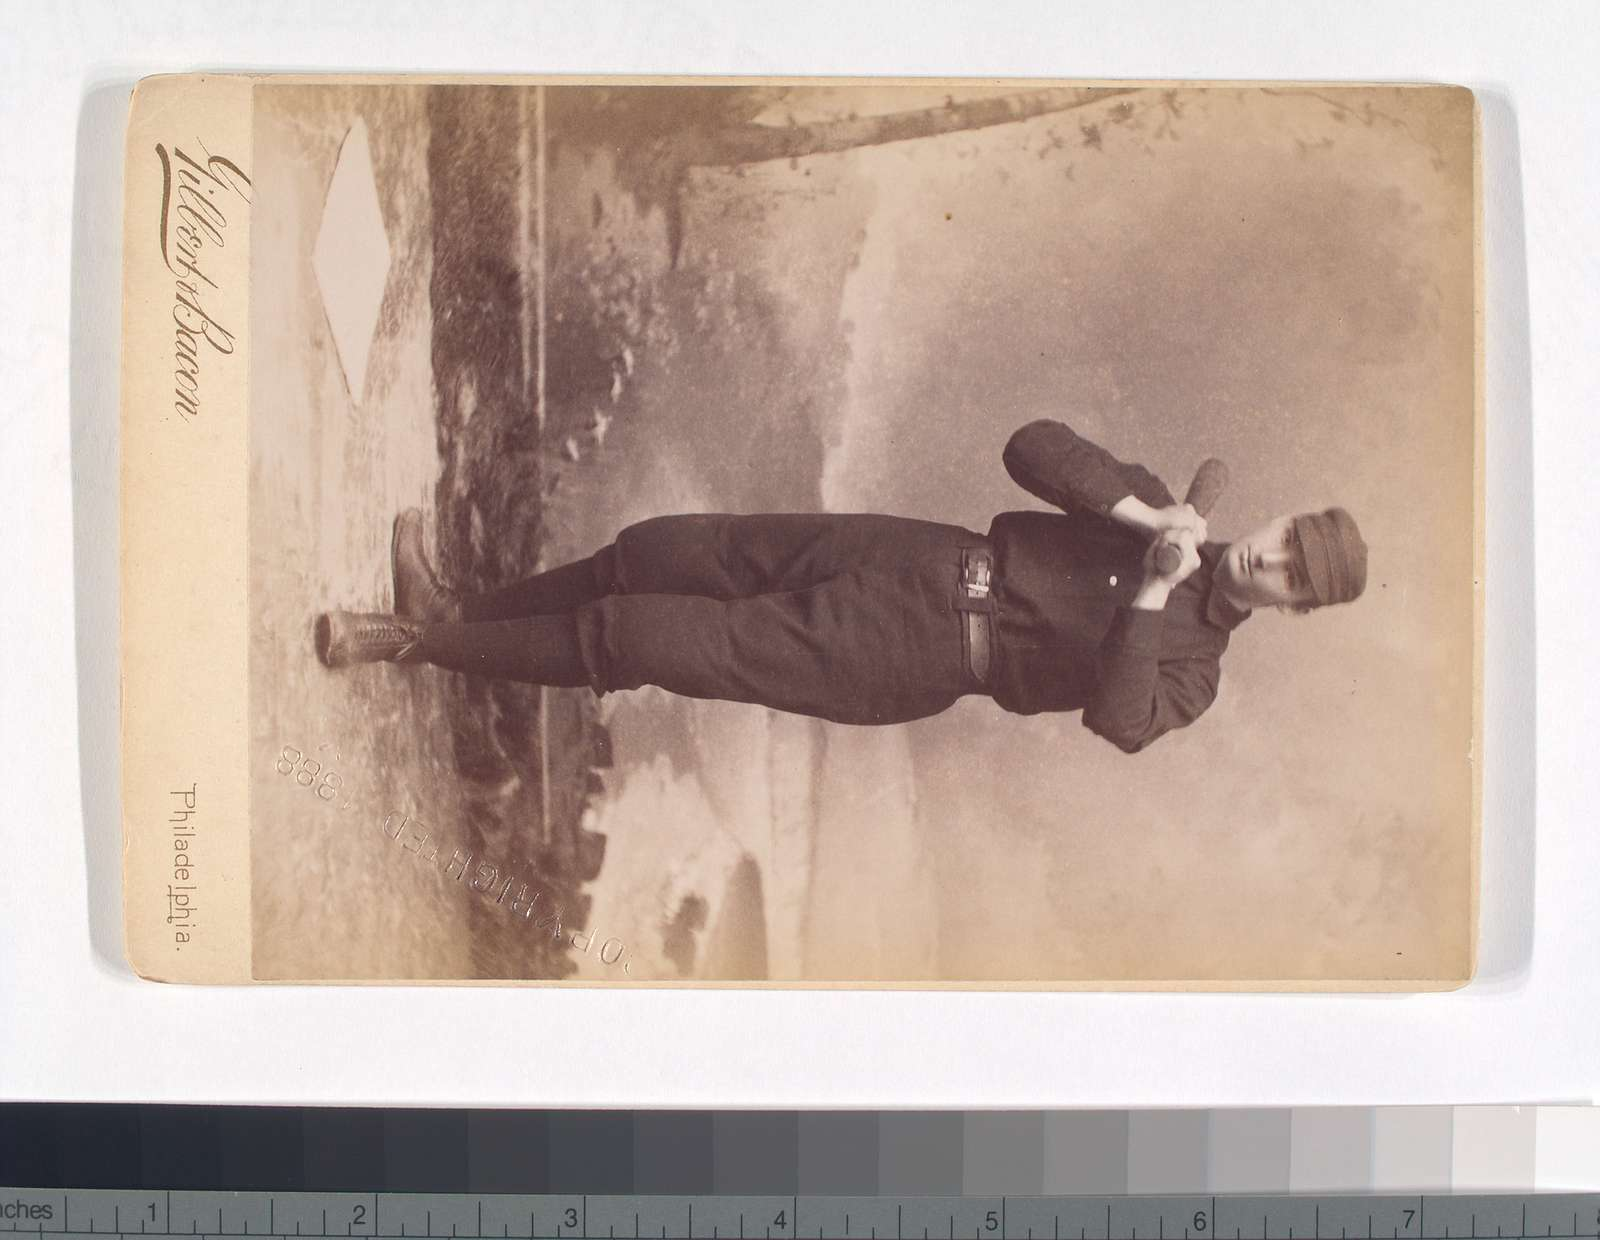 Unidentified baseball player in dark uniform - batting form -bat on shoulder